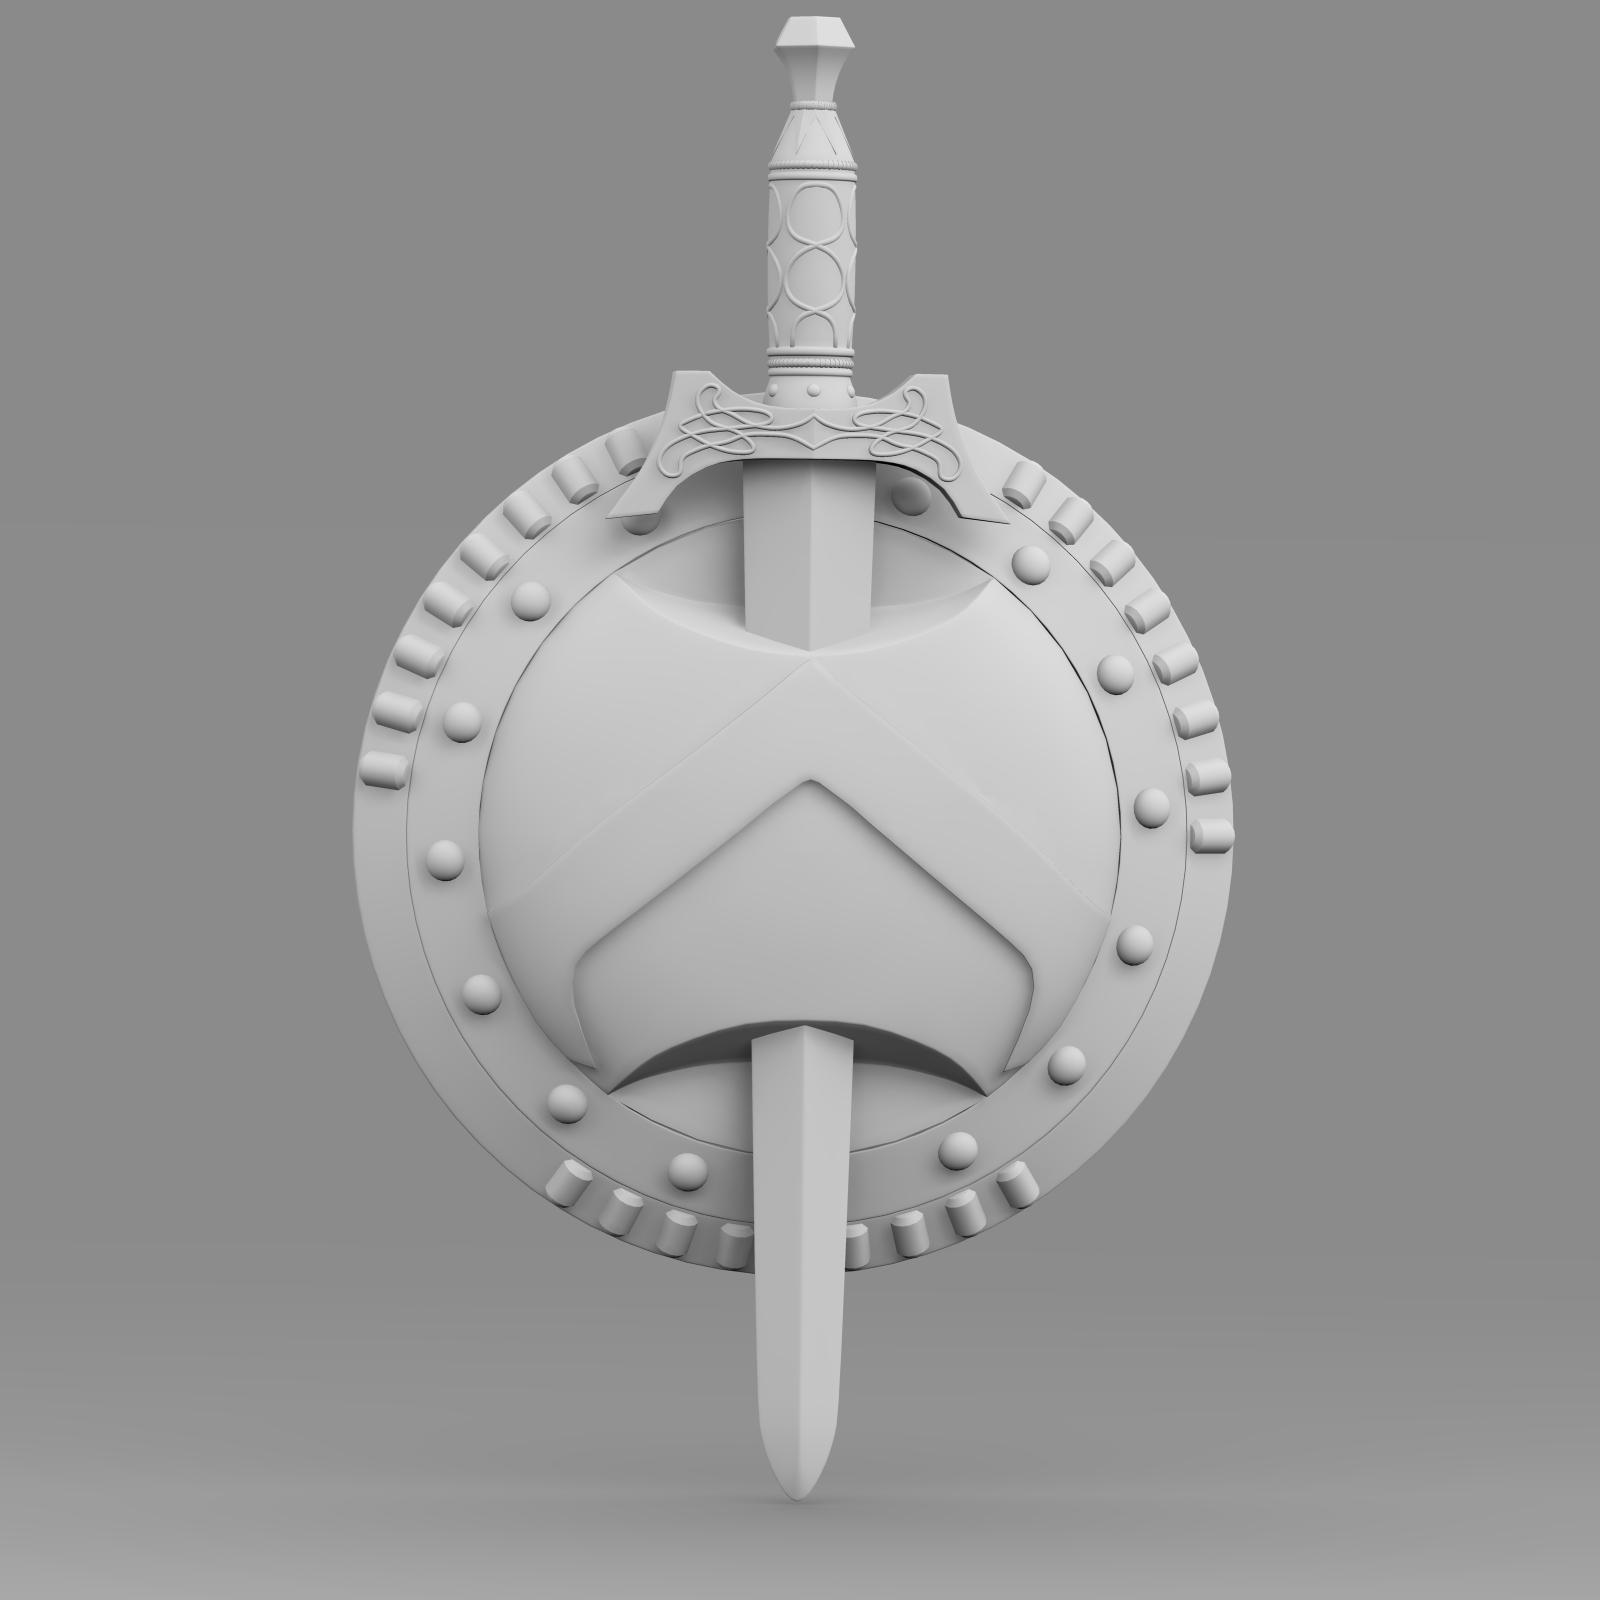 shield and sword v1 3d model 3ds fbx c4d lwo ma mb hrc xsi  obj 221434